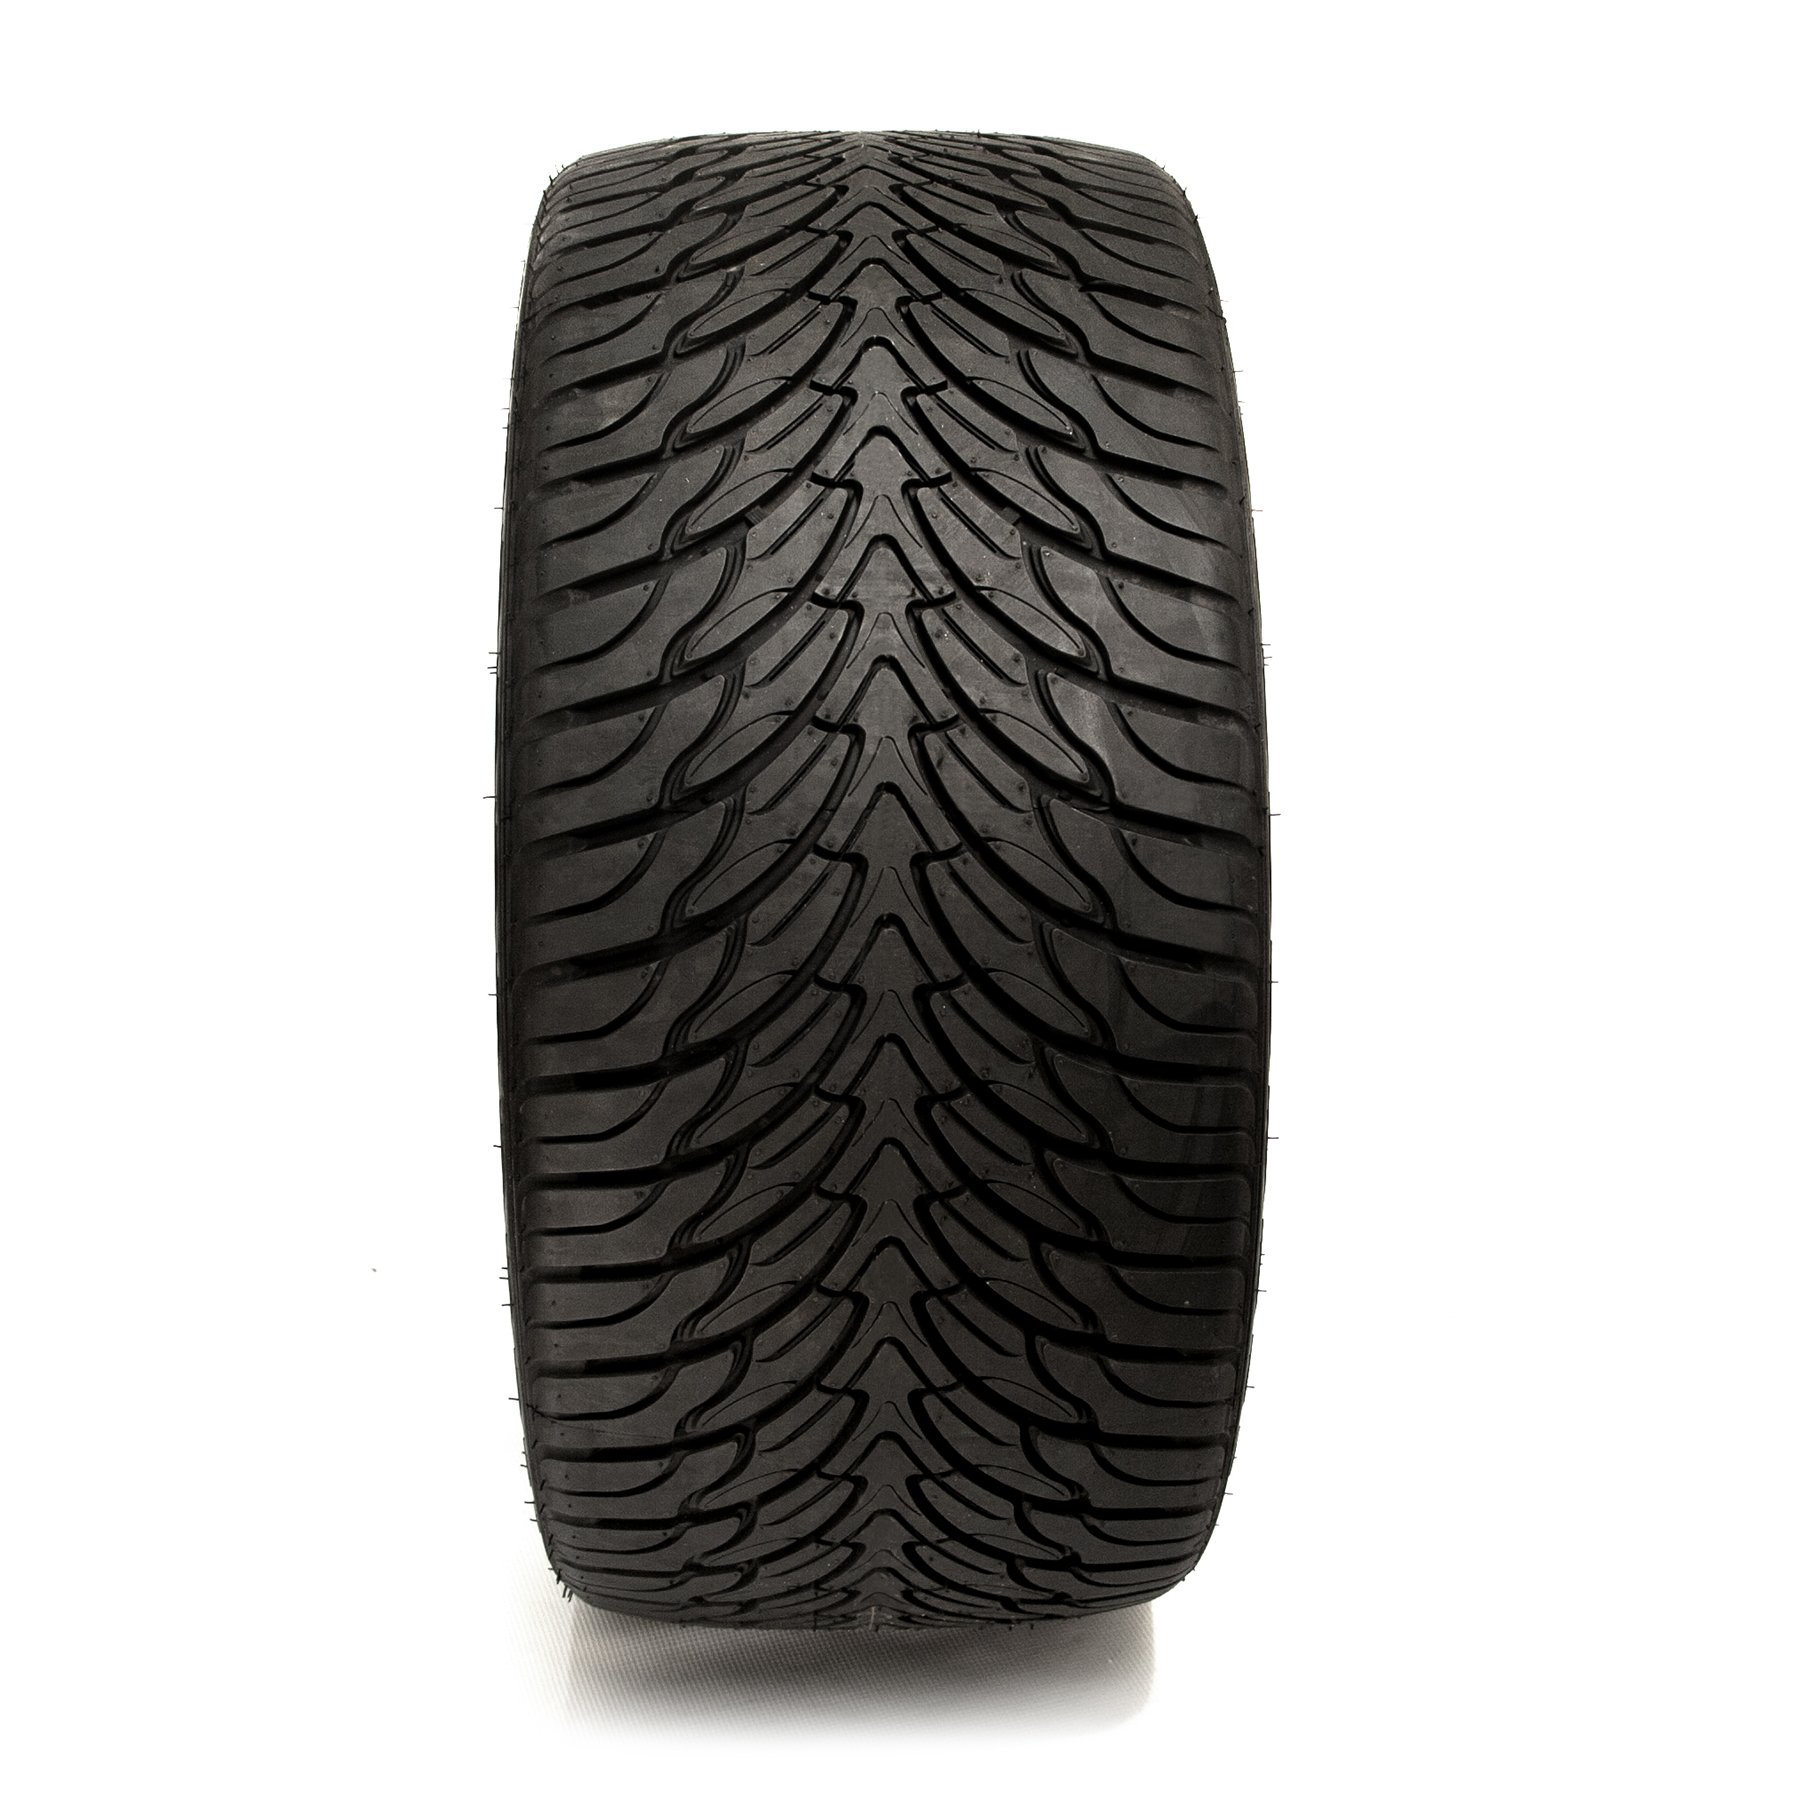 Atturo AZ800 Performance Tire 275/45R20 110V XL